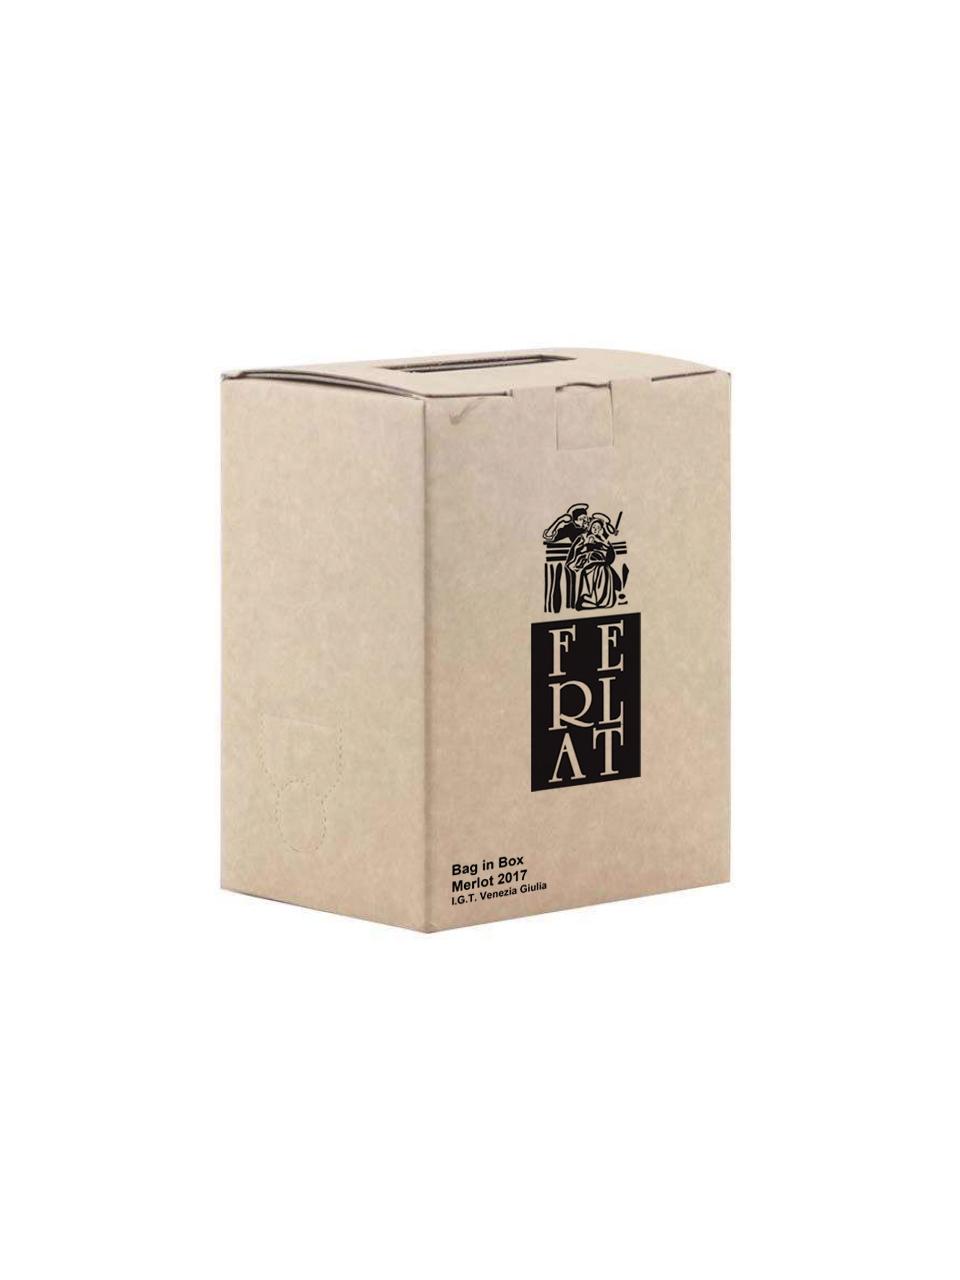 Merlot IGT Venezia Giulia 2018 - Bag-In-Box